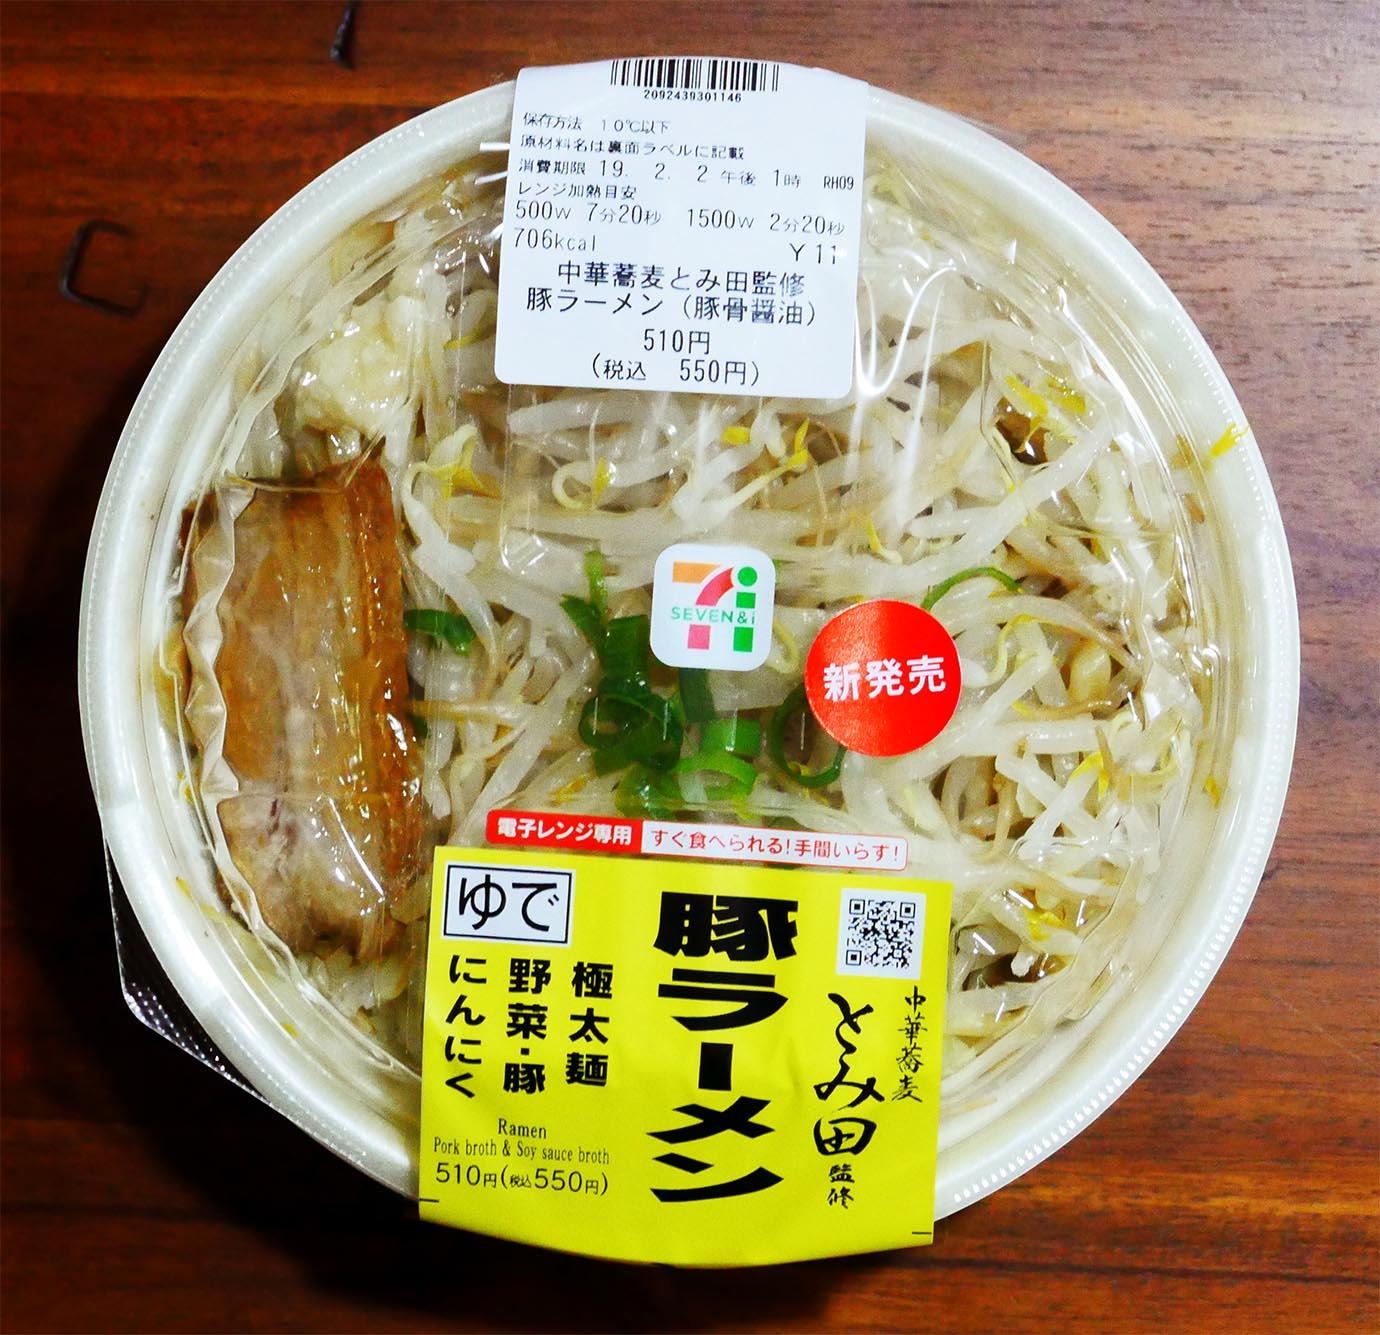 sej-ramen-jiro-tomita3